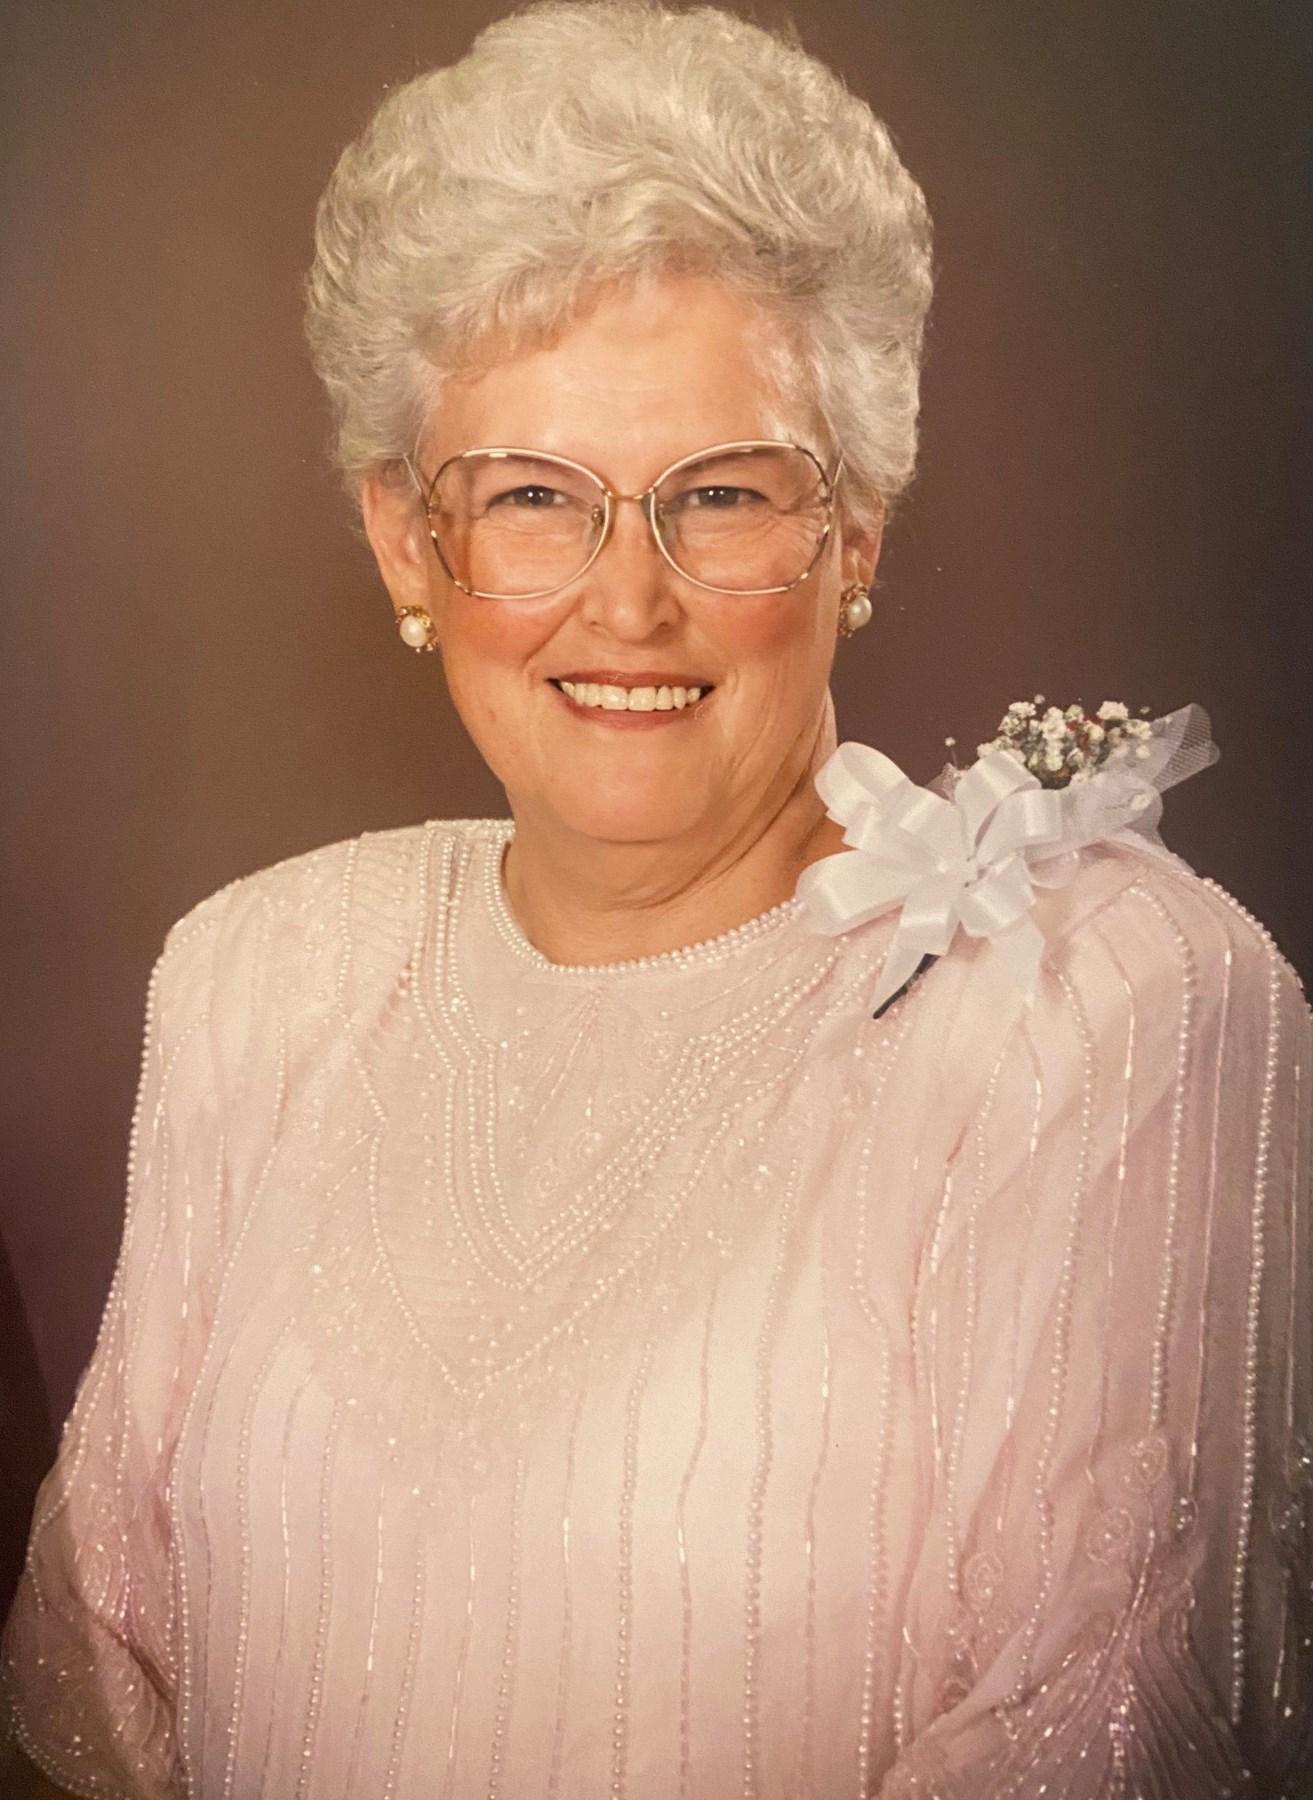 lena hutcherson memphis tn obituary - Memphis Funeral Home And Memorial Gardens Germantown